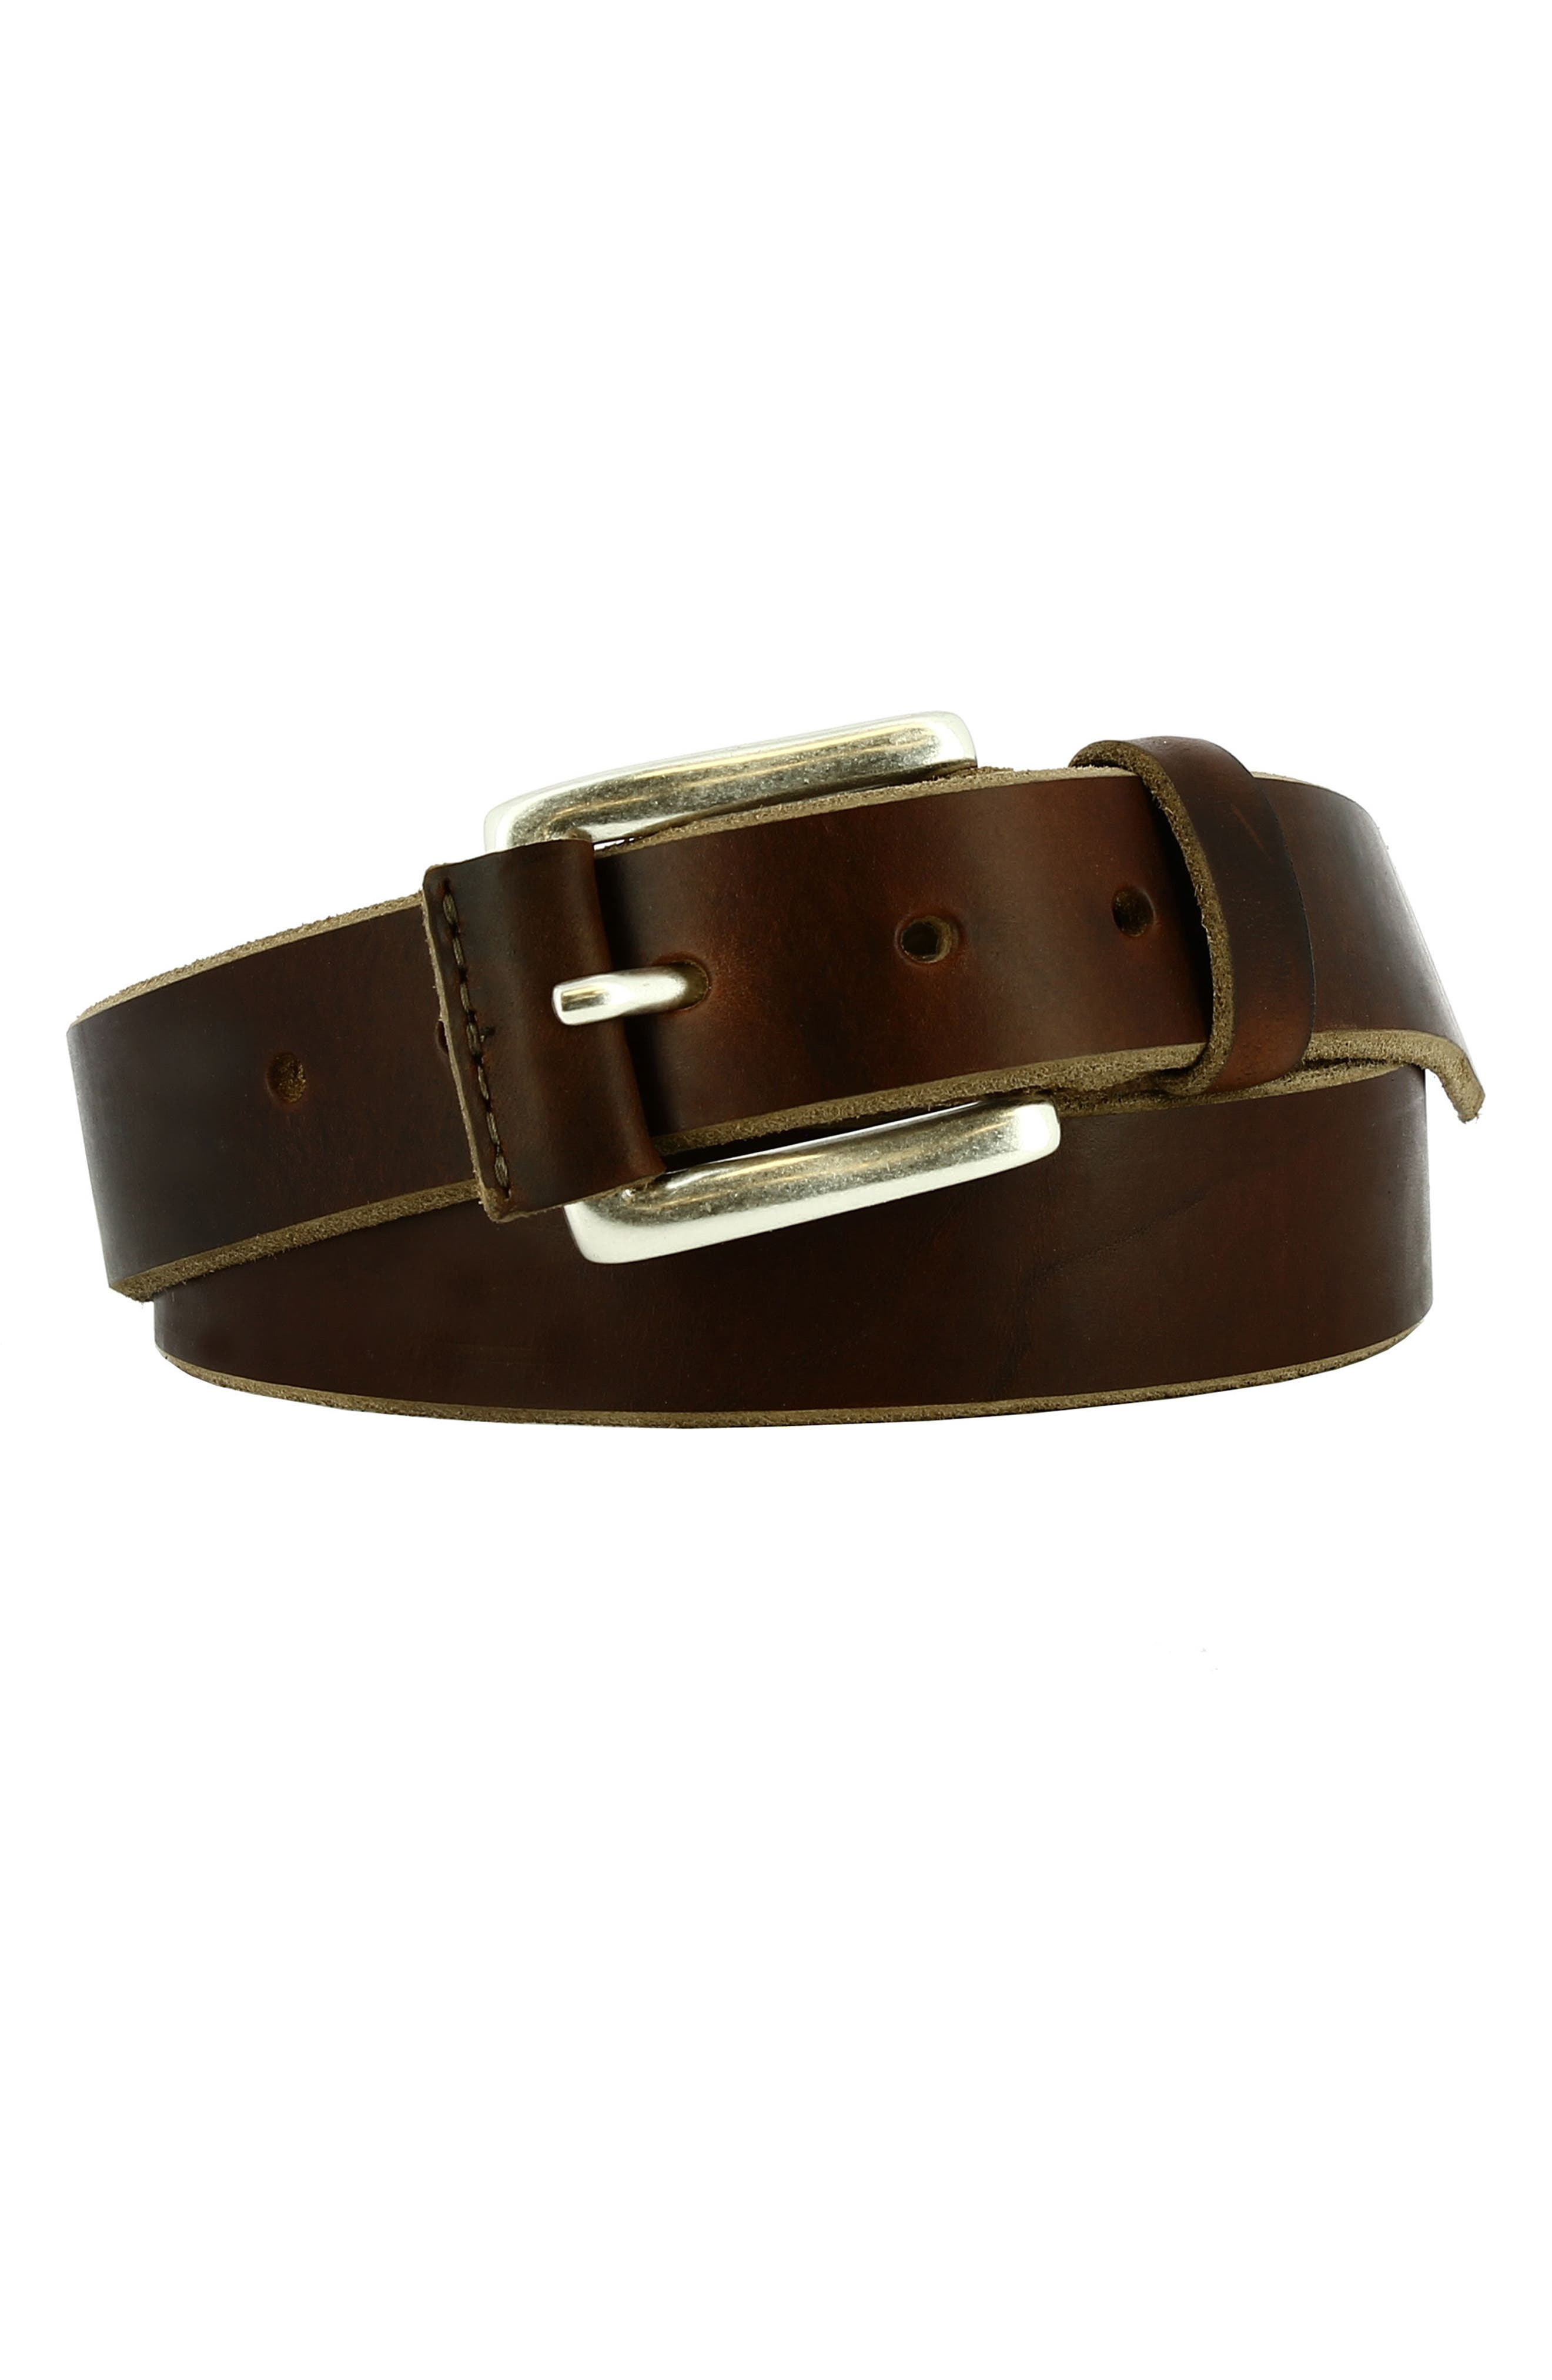 Coraggio Leather Belt,                             Main thumbnail 1, color,                             Bourbon